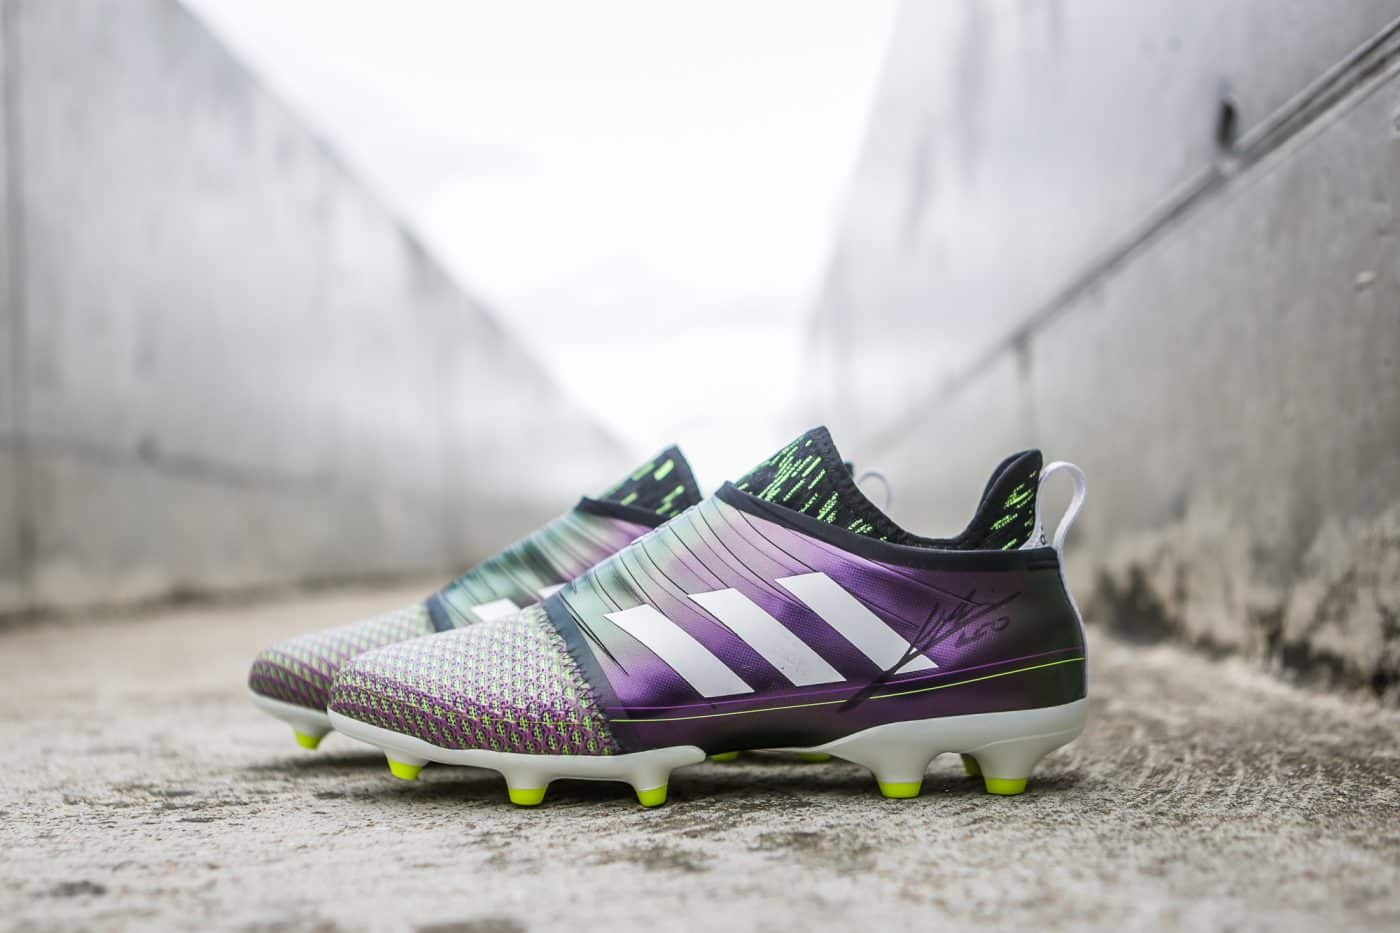 adidas-glitch-skin-F50-lionel-messi-footpack-3